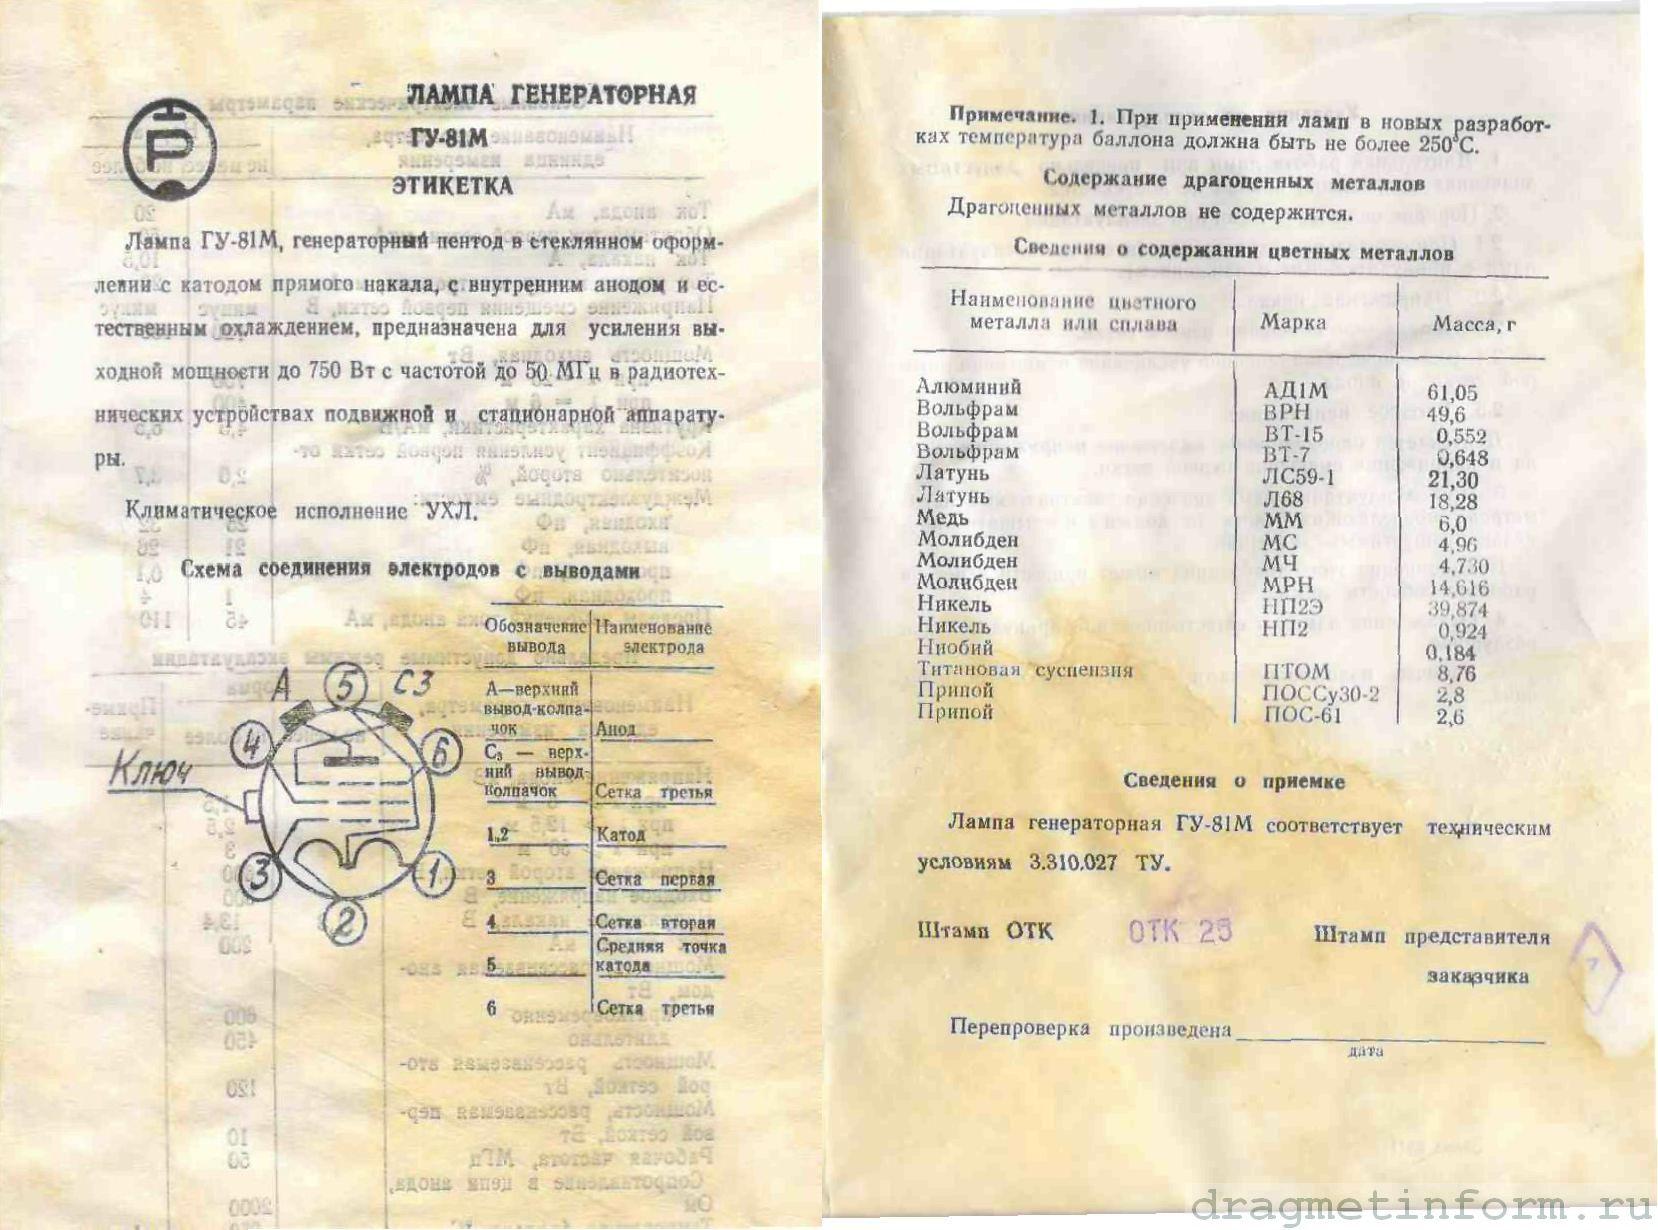 Формуляр ГУ-81М